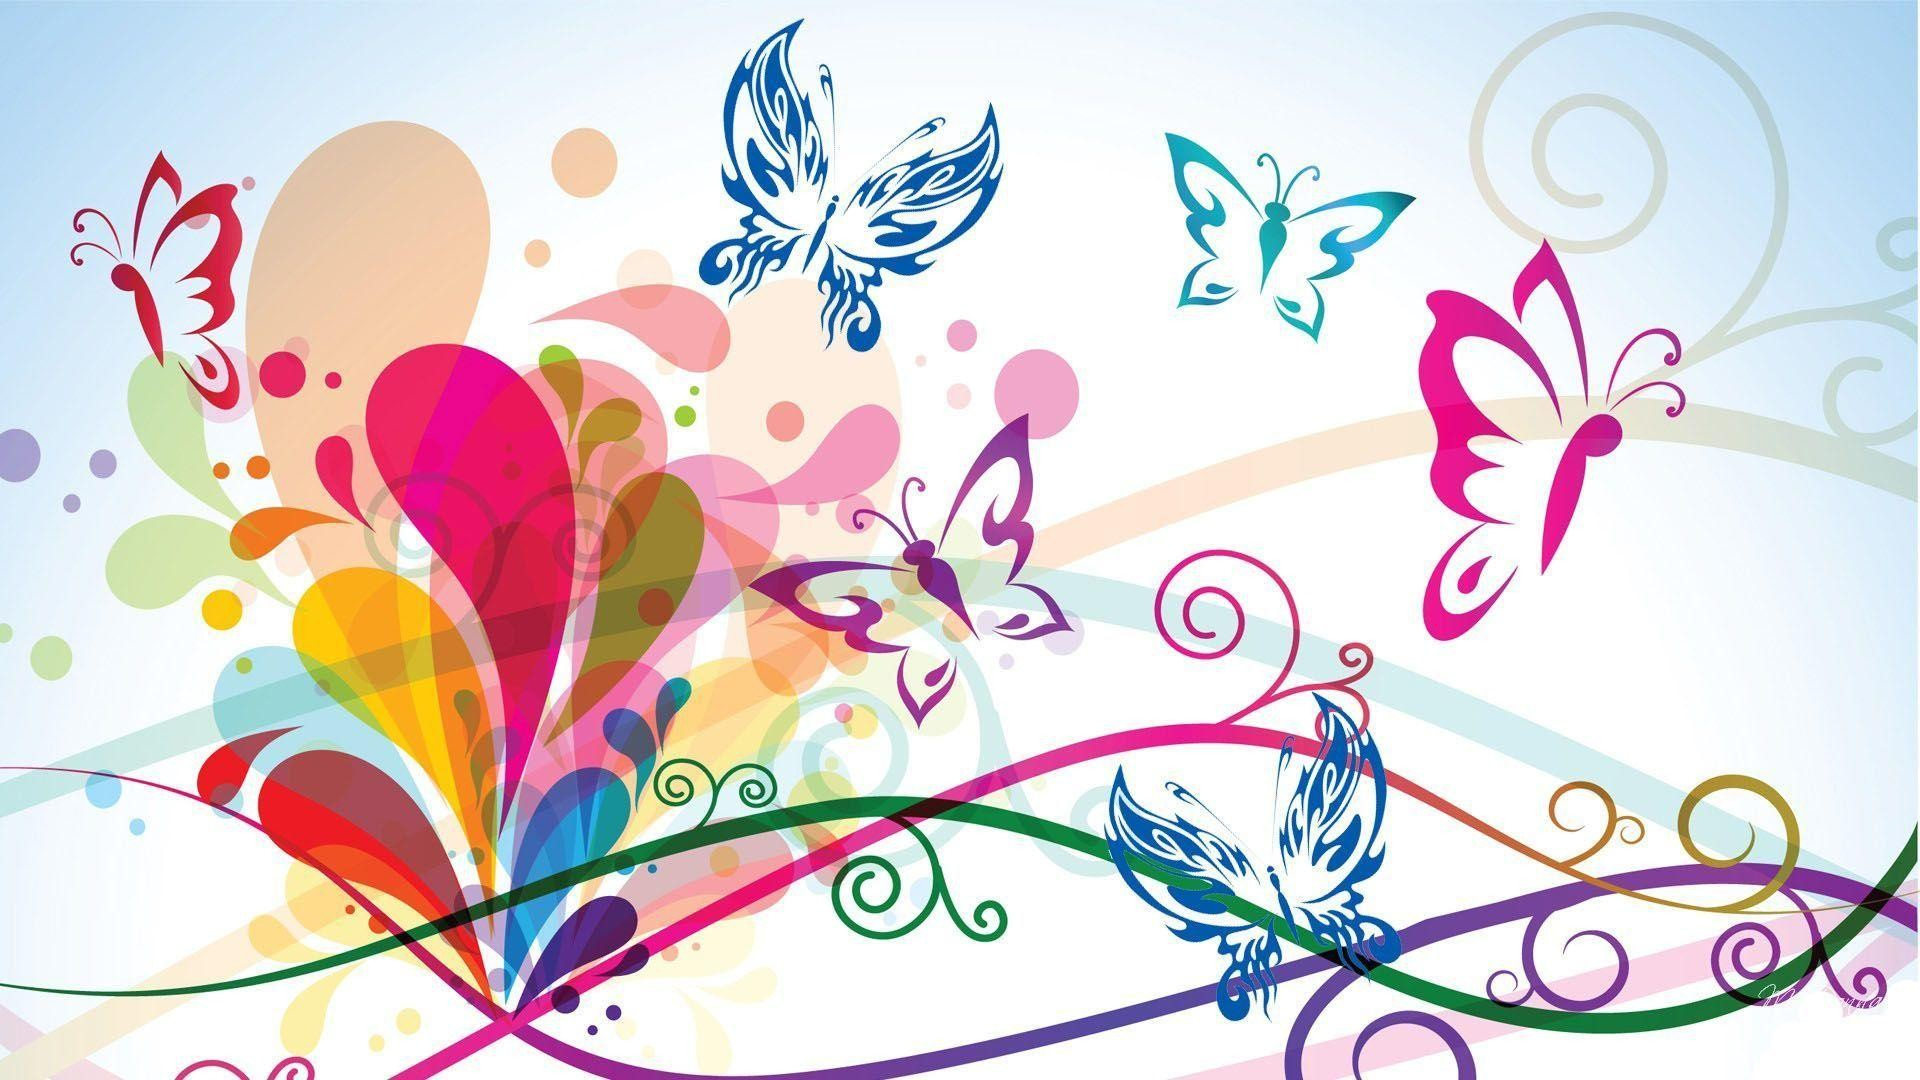 Women's Day Vector Flowers wallpaper picture